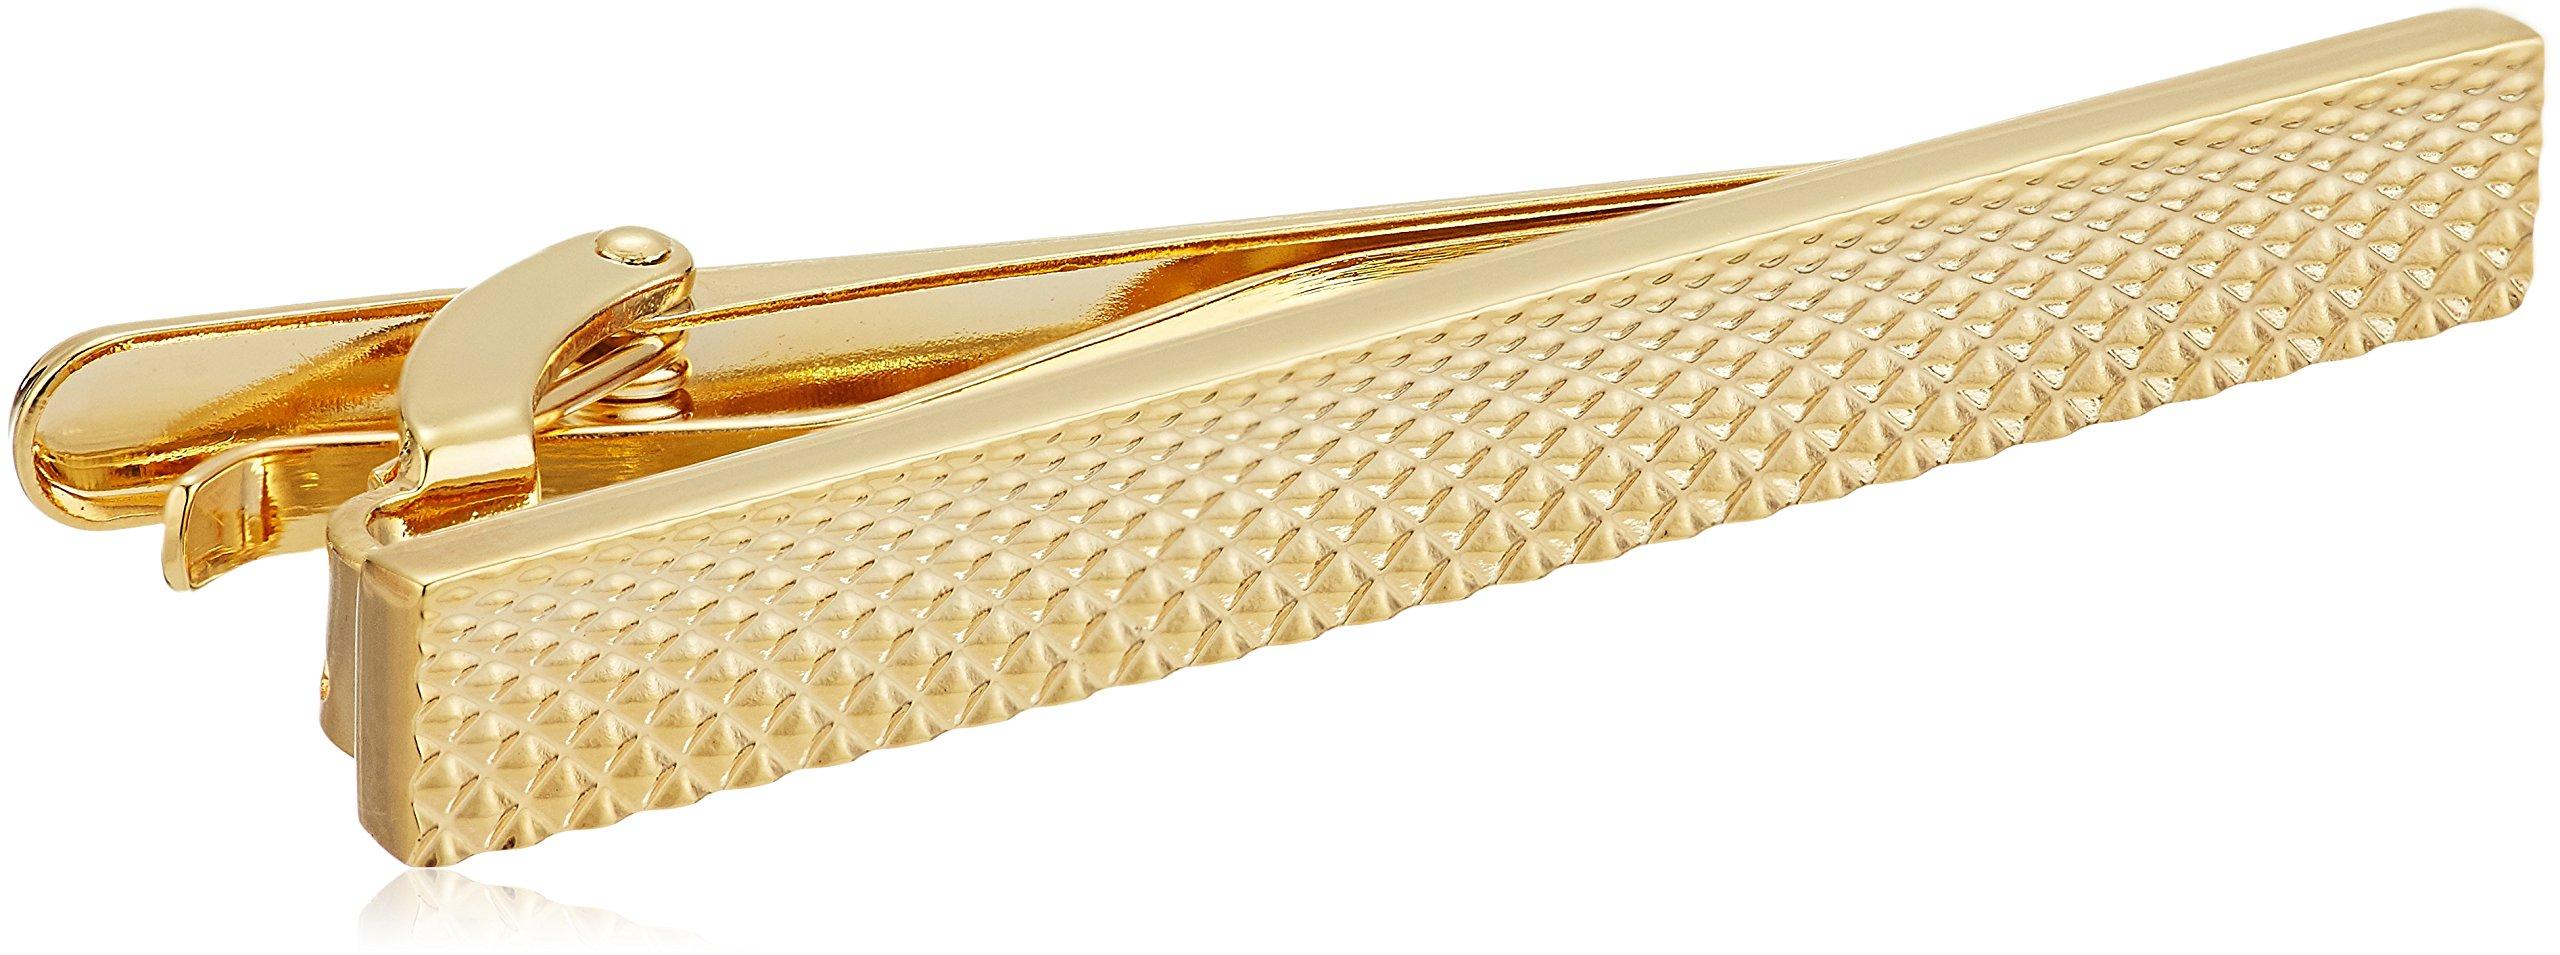 Stacy Adams Men's Textured Tie Bar, Gold, One Size